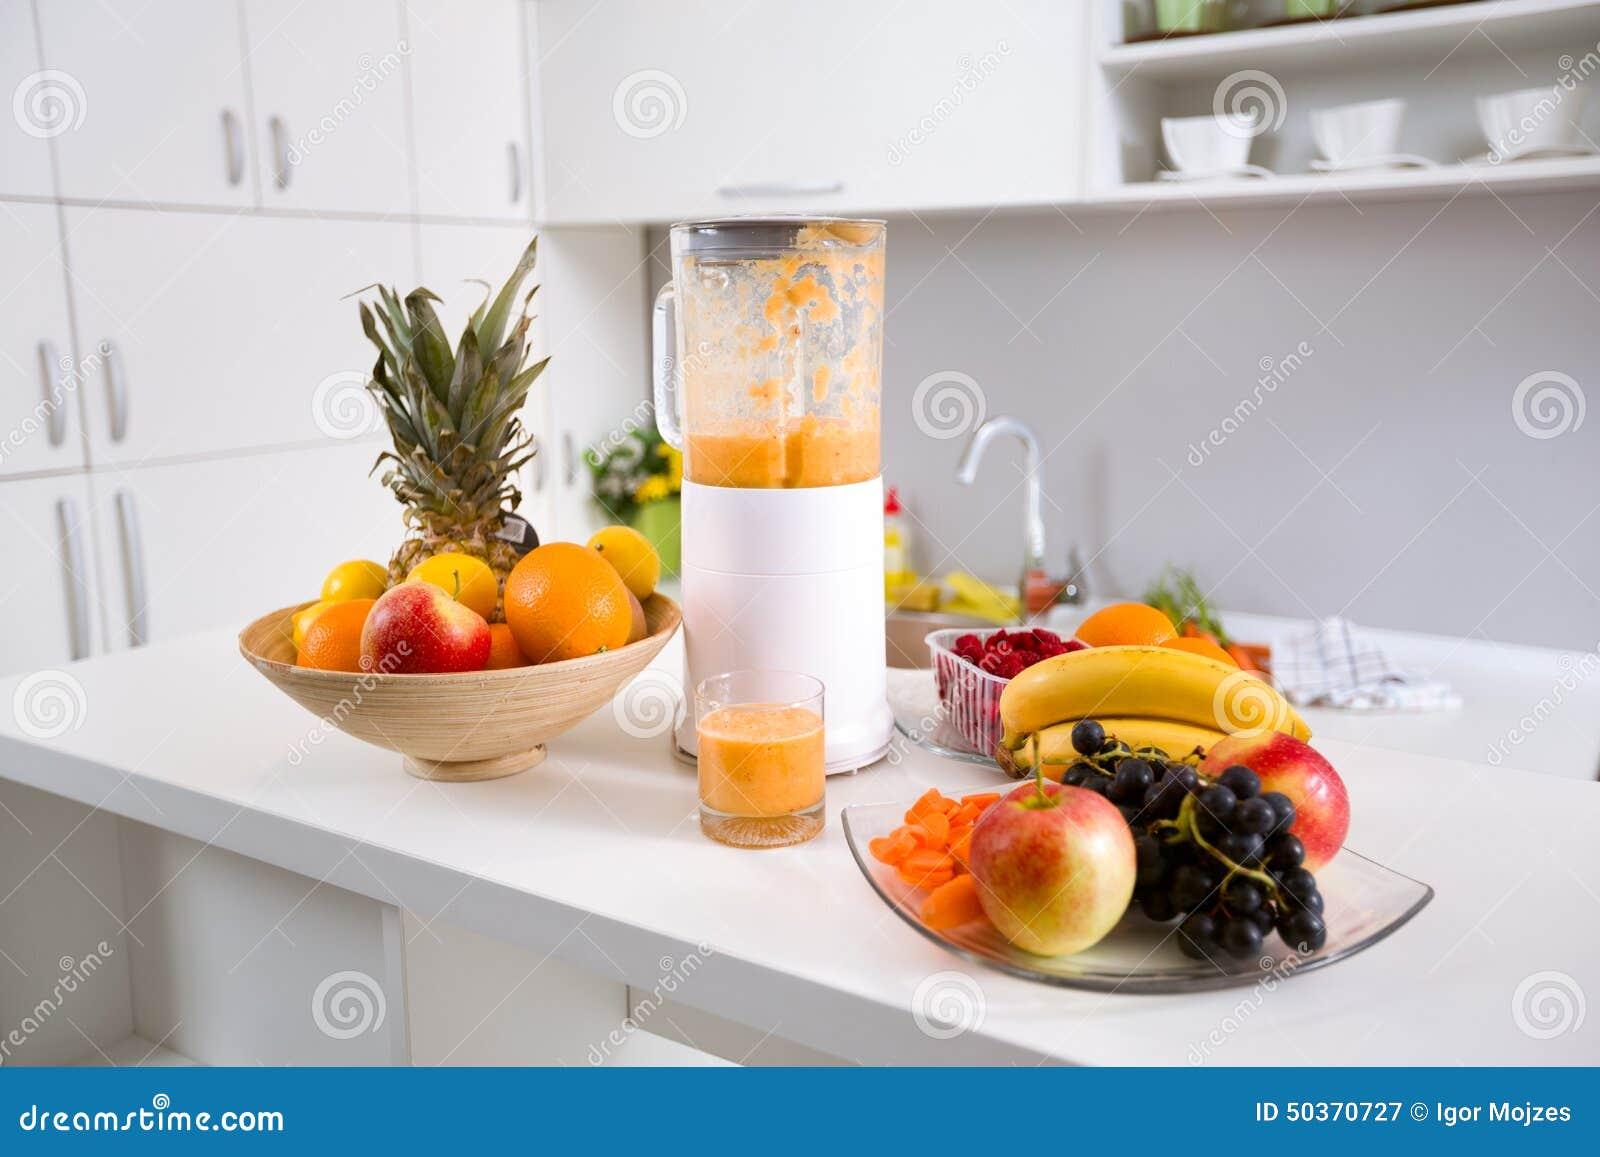 Kitchen Table Fruit Bowl